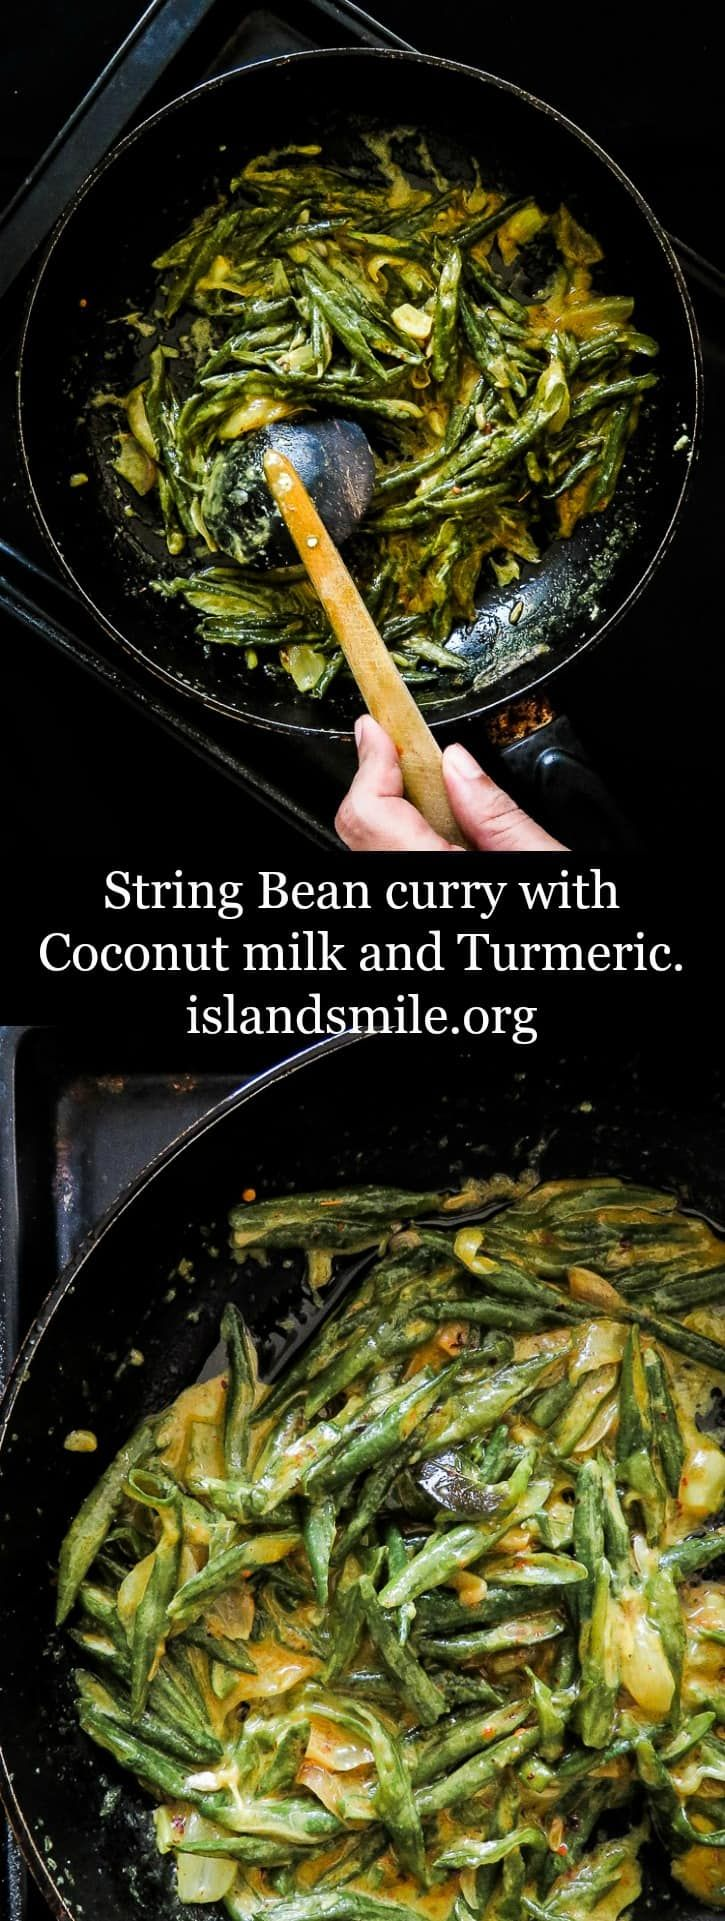 String-bean-curry-with-Turmeric-and-Coconut-milk-(Sri Lankan)-islandsmile.